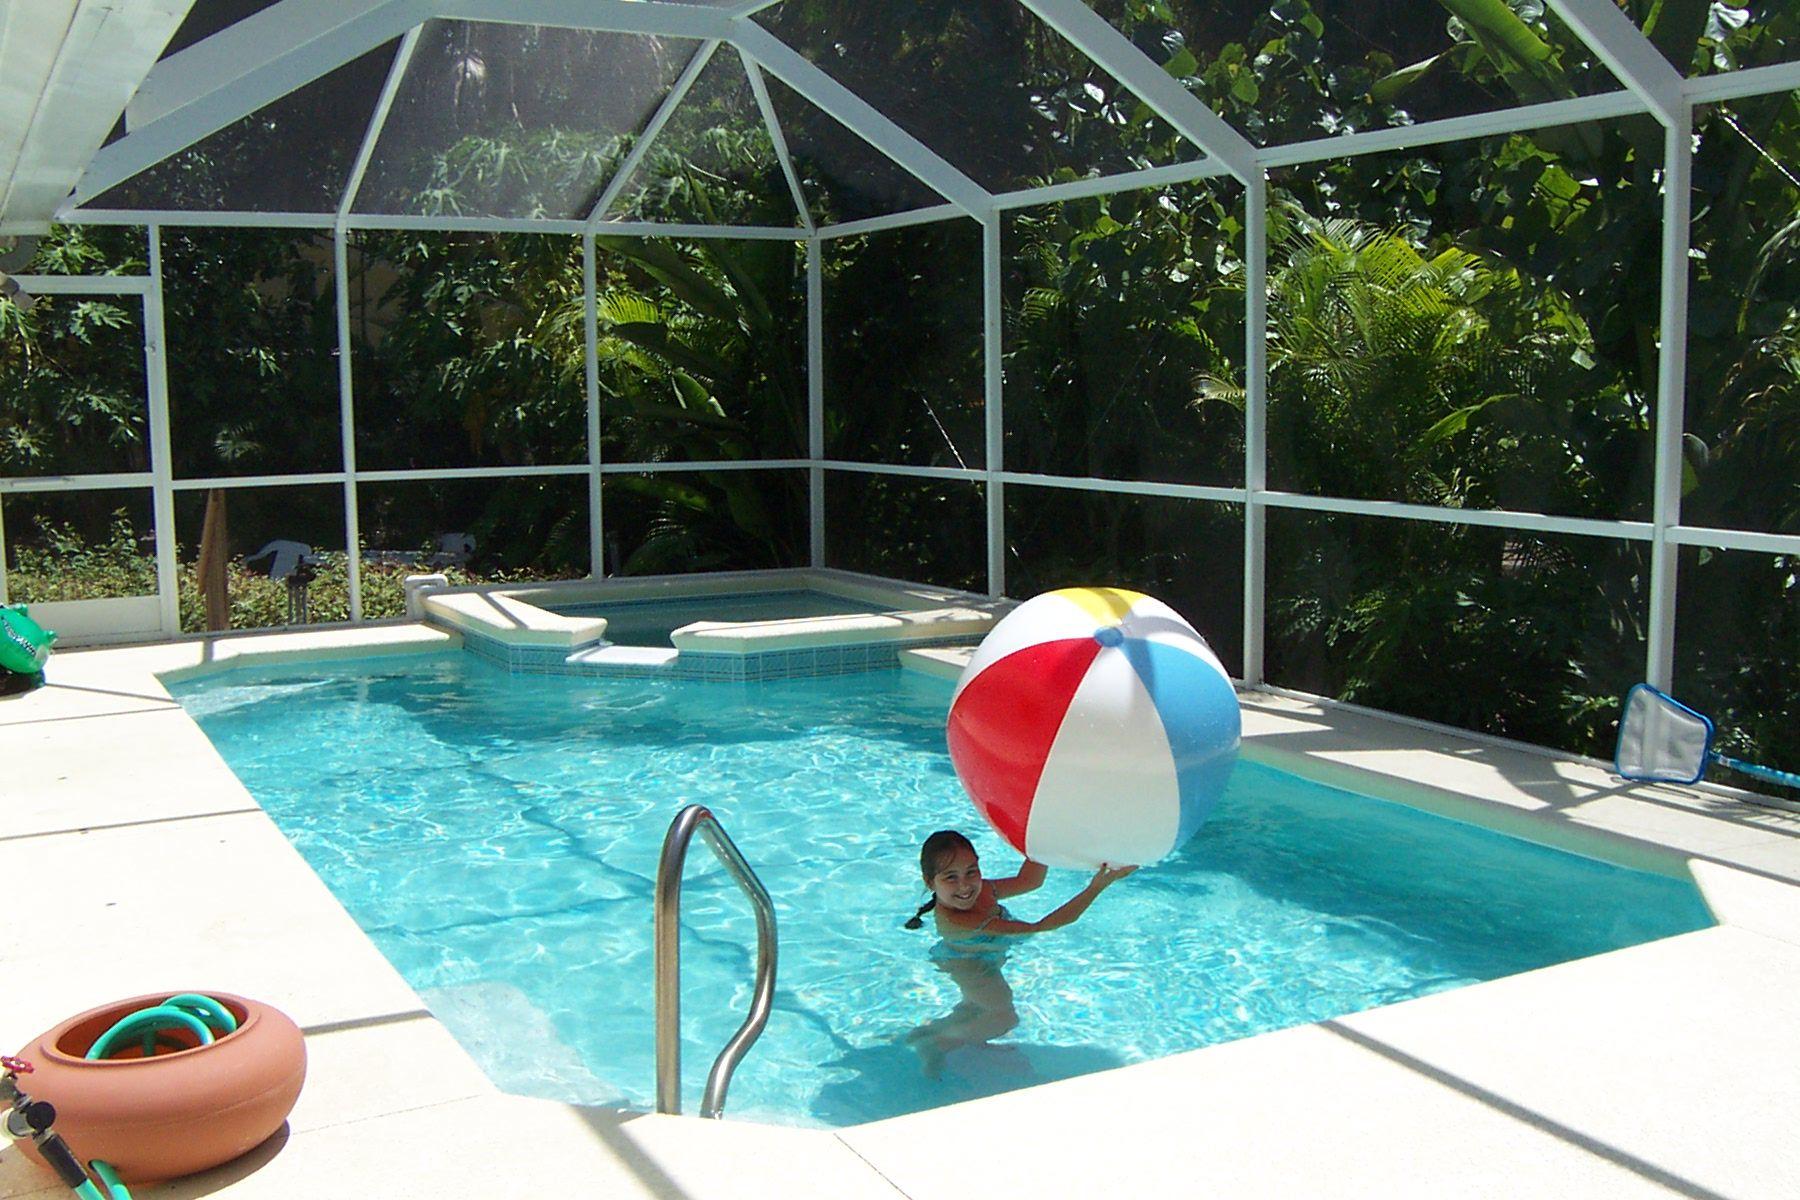 Small Pool Pool Houses Pool Designs Vacation